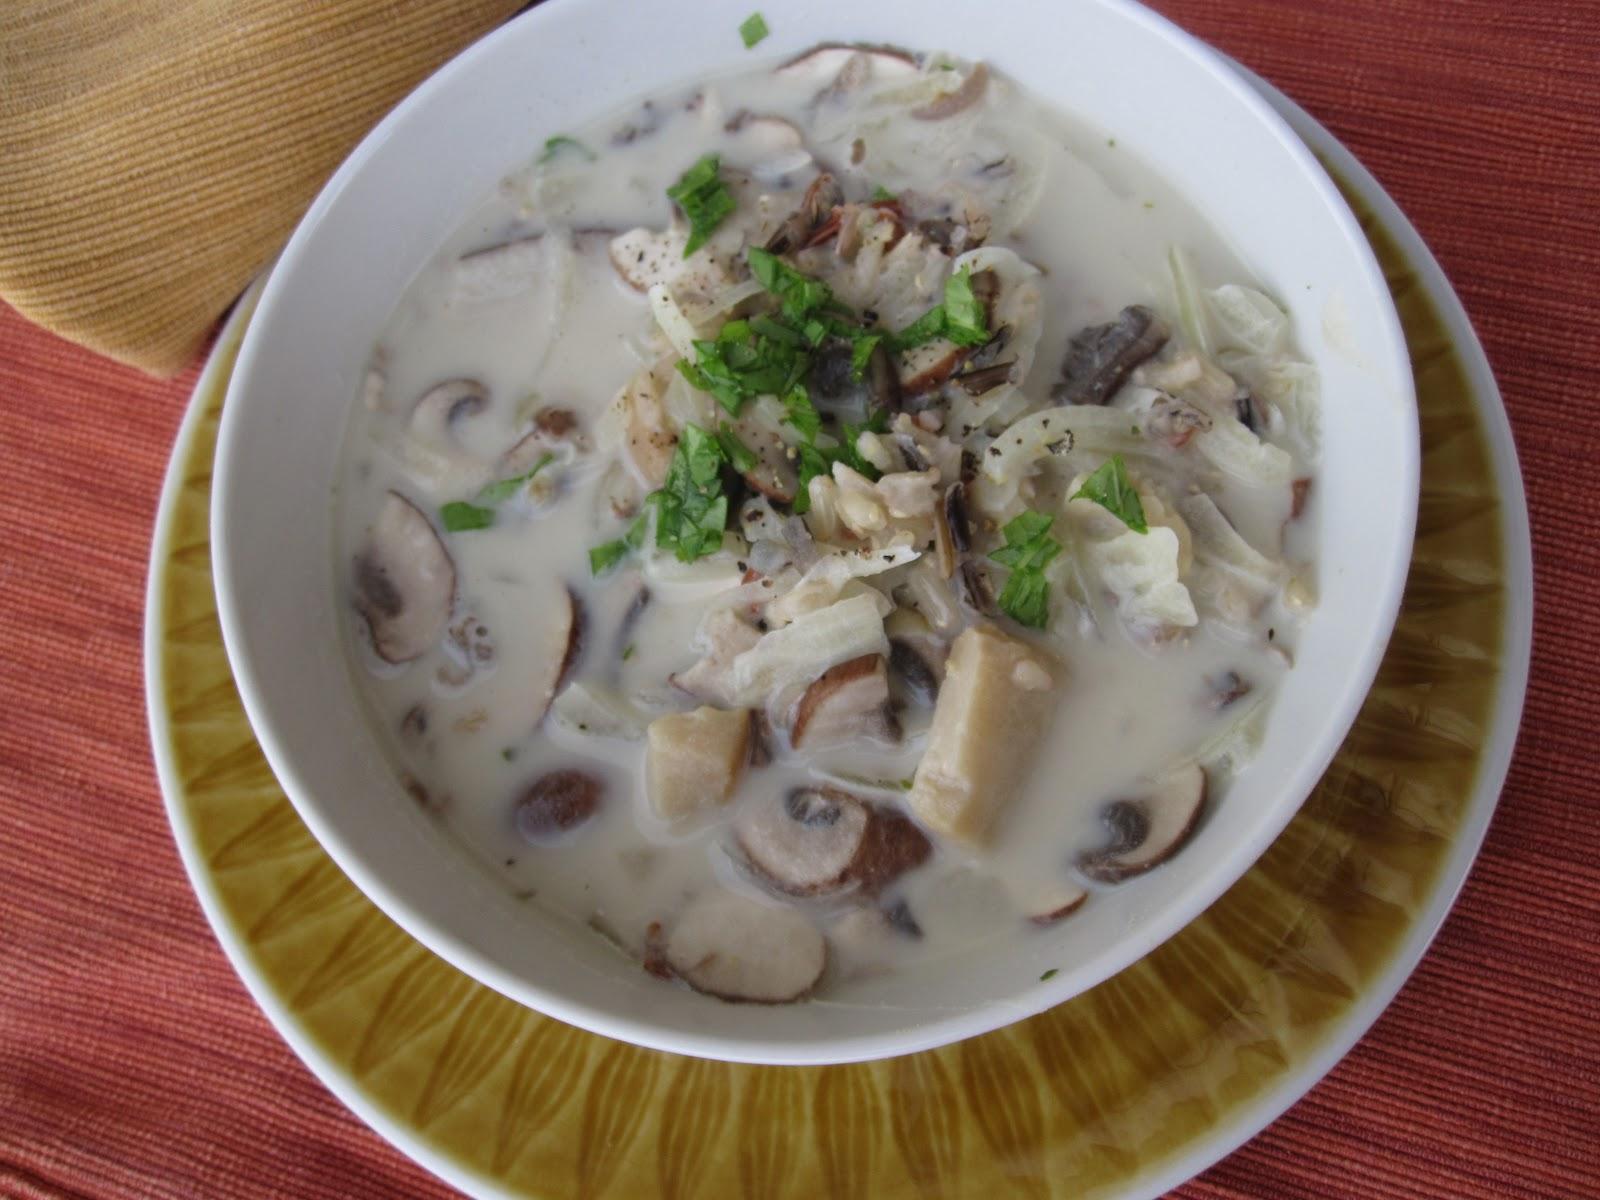 ... wild rice mushroom wild rice mushroom soup chicken wild rice soup with